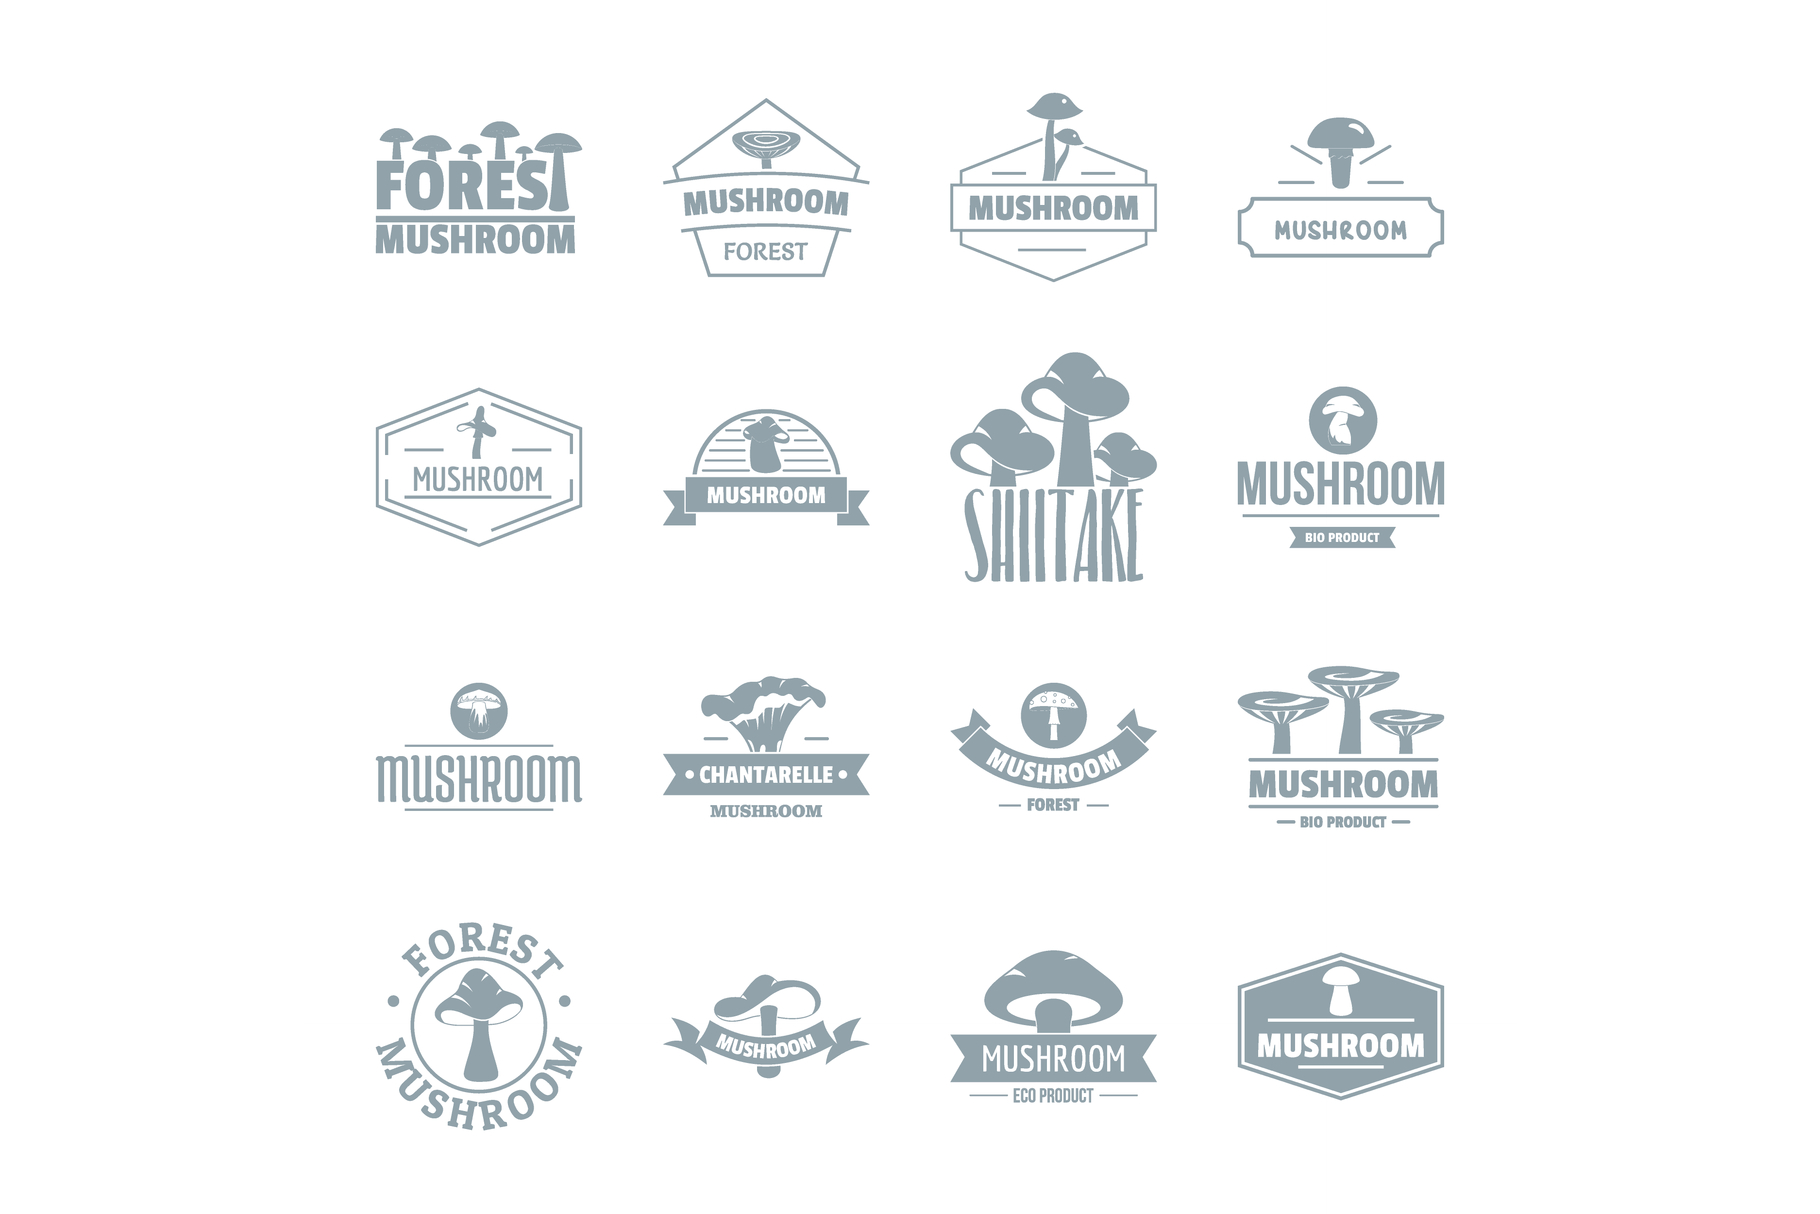 Mushroom forest logo icons set, simple style example image 1